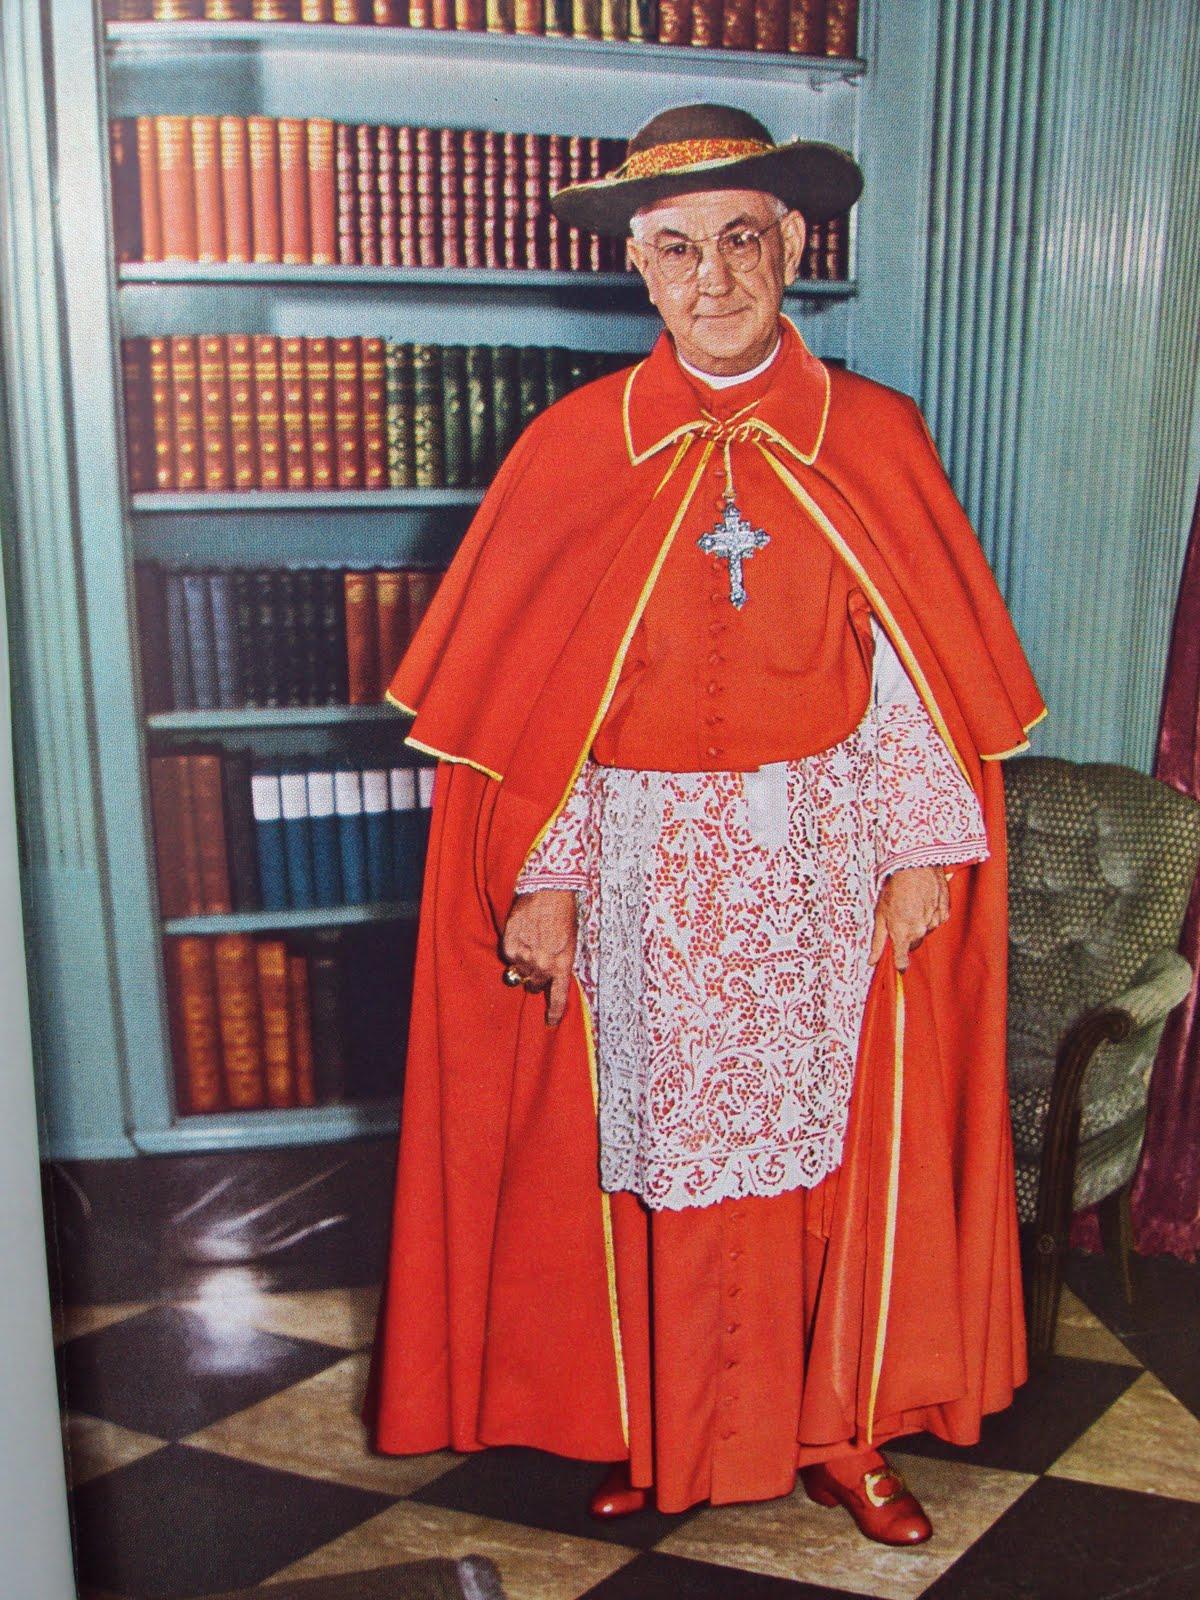 3rd Pope Leo